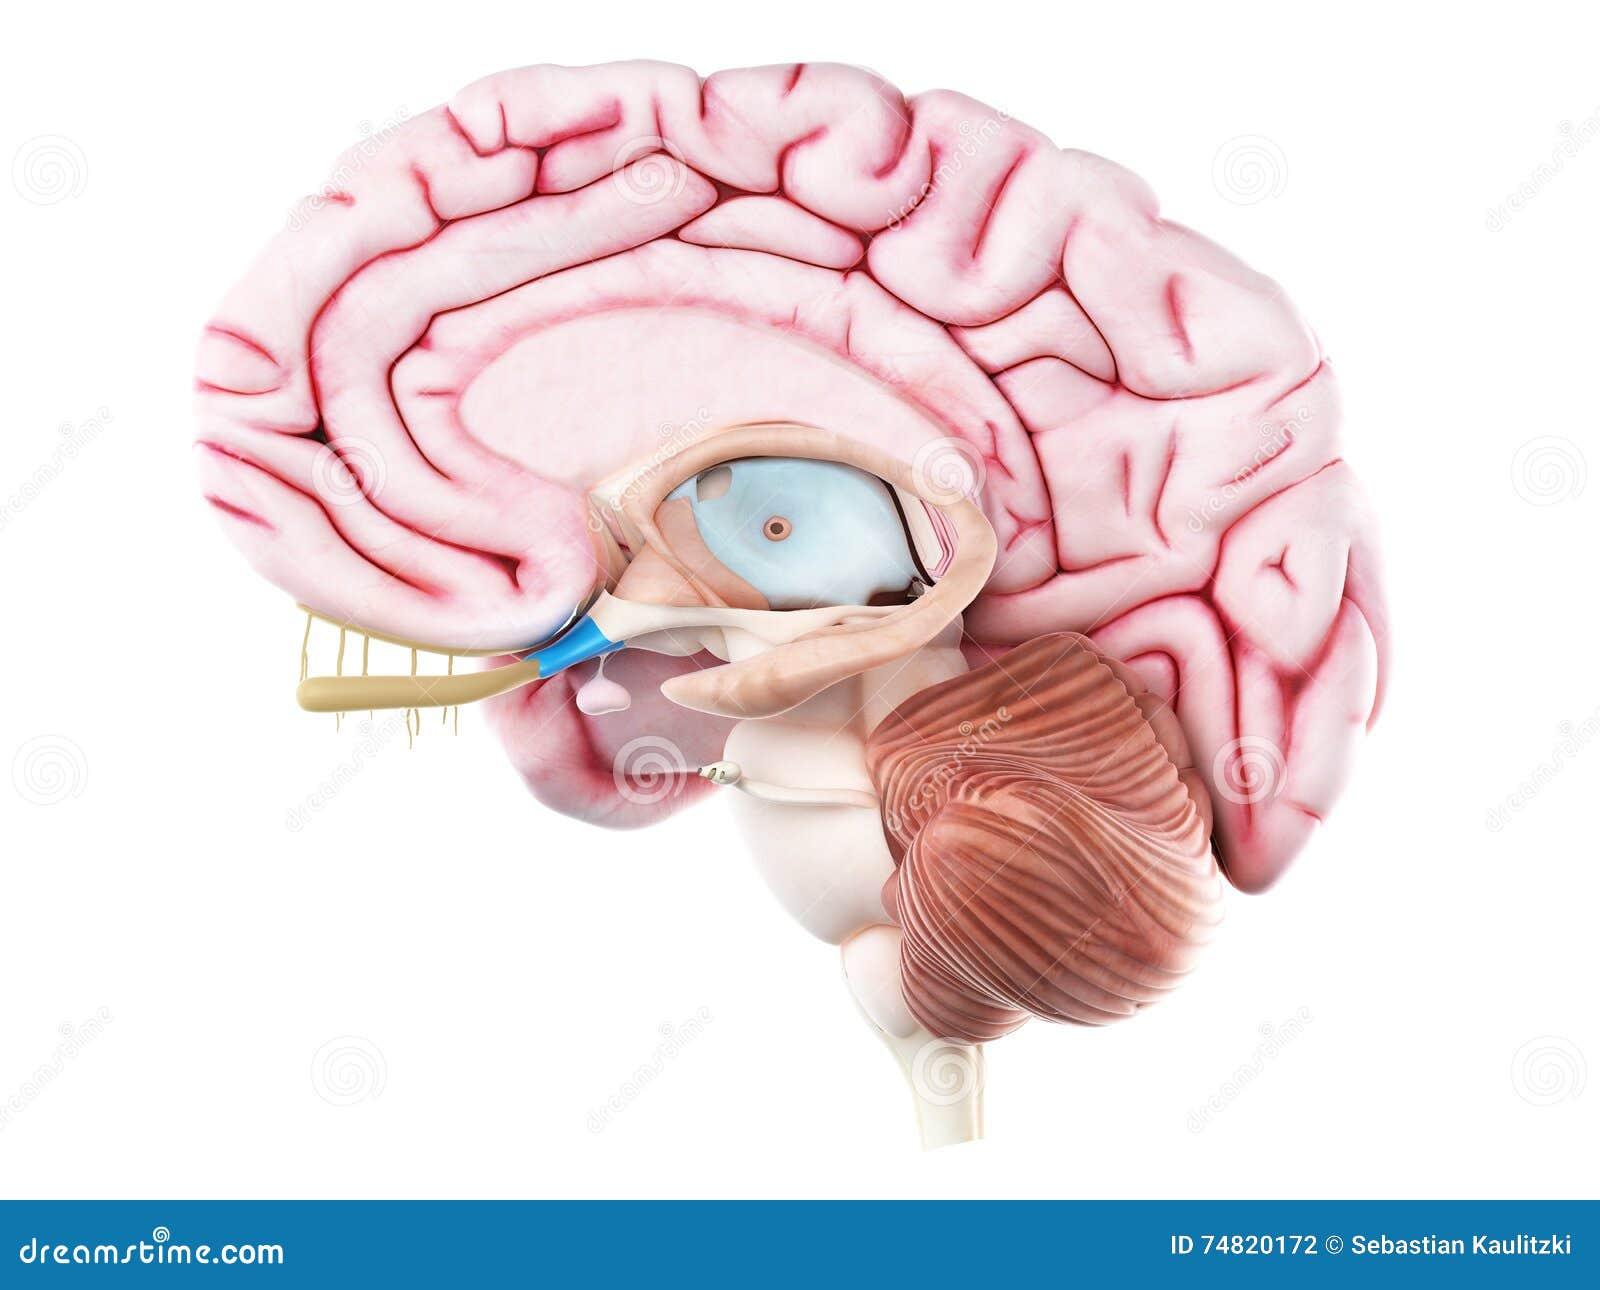 The optic chiasm stock illustration. Illustration of anatomy - 74820172